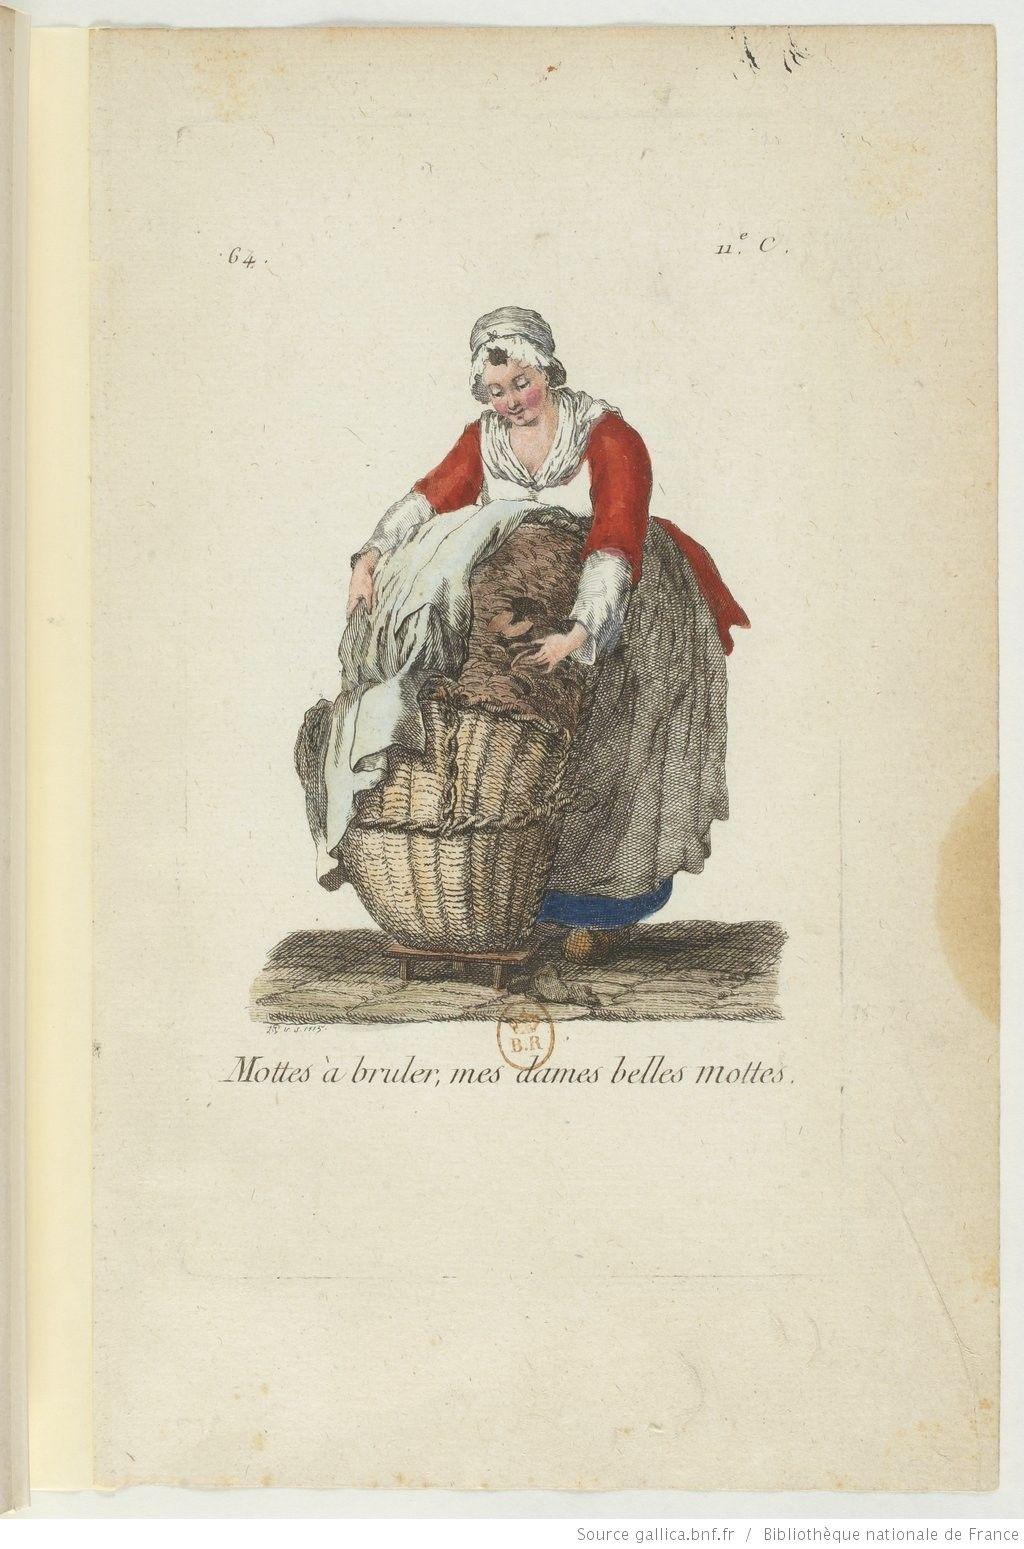 Mottes A Bruler Mes Dames Belles Mottes 18th Century Seller Of Fire Starters Gallica Dessin Illustration Vieux Metiers